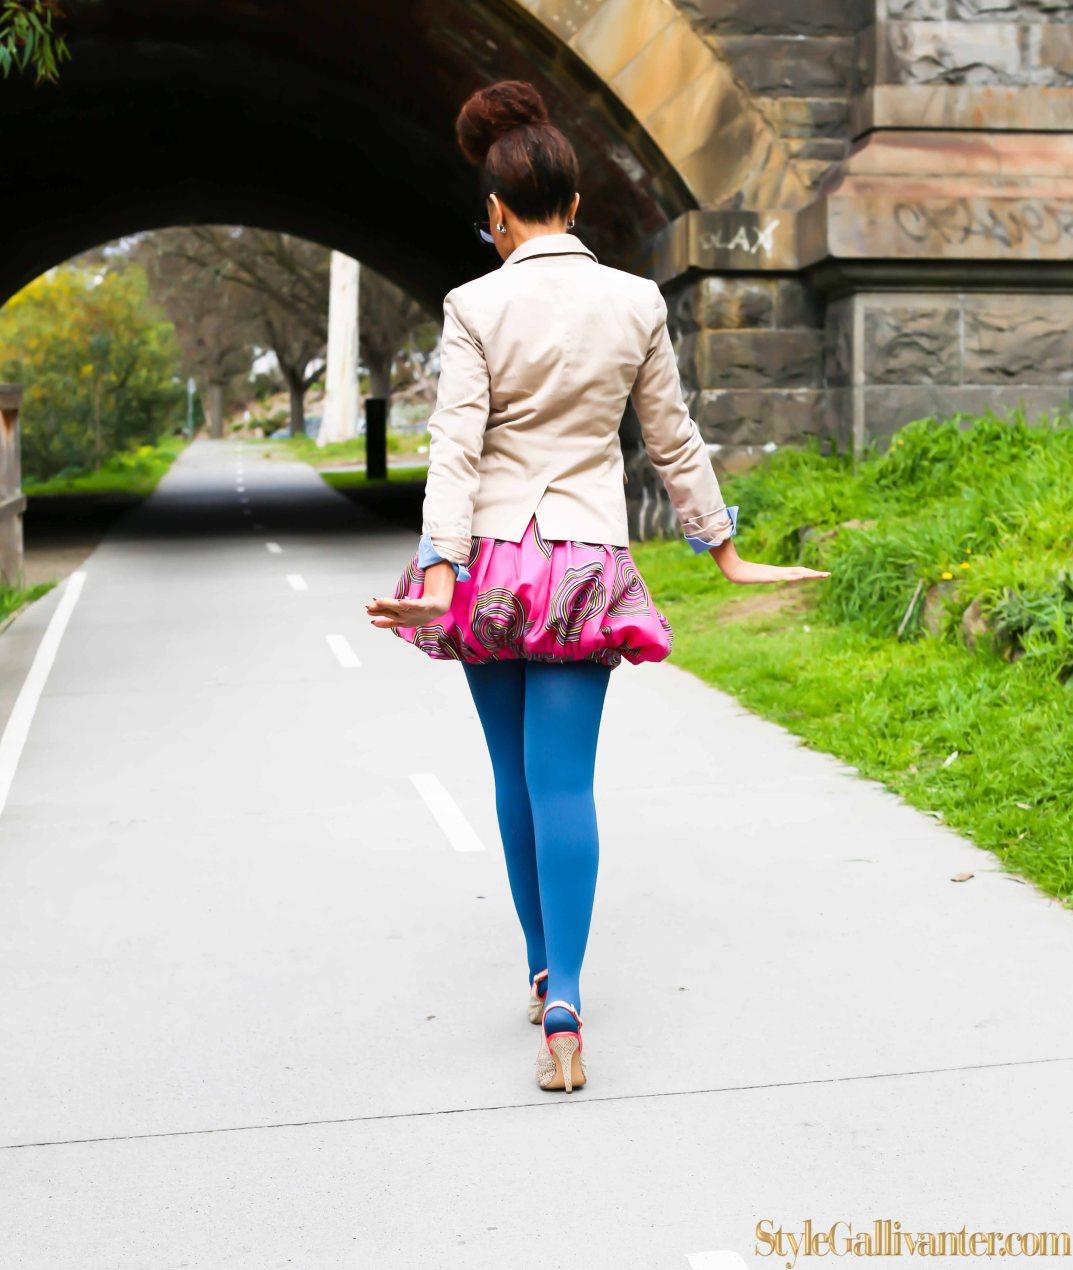 Stylegallivanter-logo_sakhino.com_style-gallivanter.com_miranda_style-gallivanter_melbourne's-african-fashion-bloggers-australia